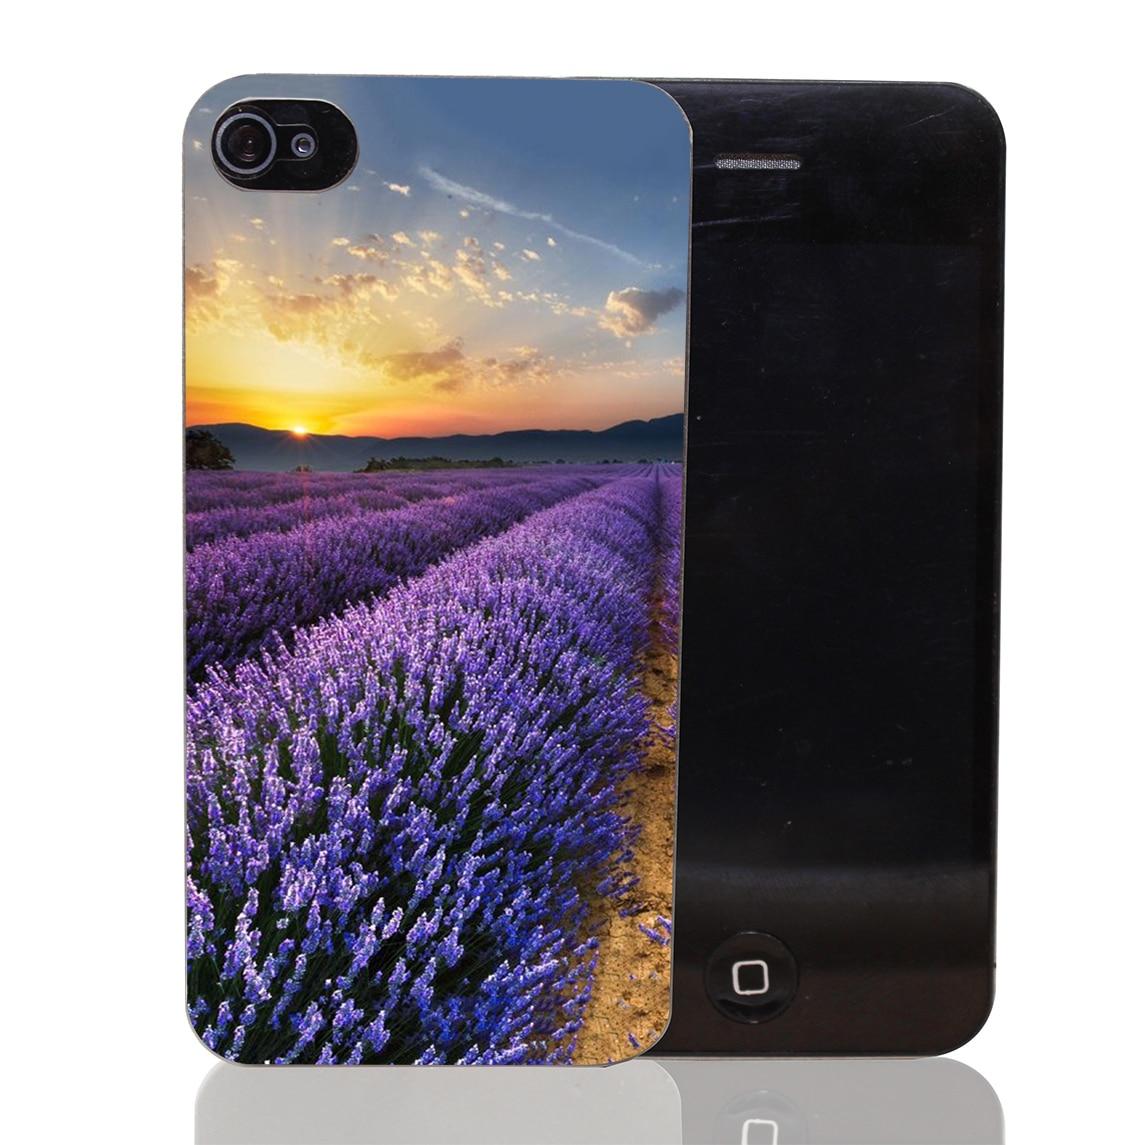 3396CA Sunrise lavender garden Hard Transparent Case Cover for iPhone 4 4s 5 5s 5c SE 6 6s Plus Thin Style